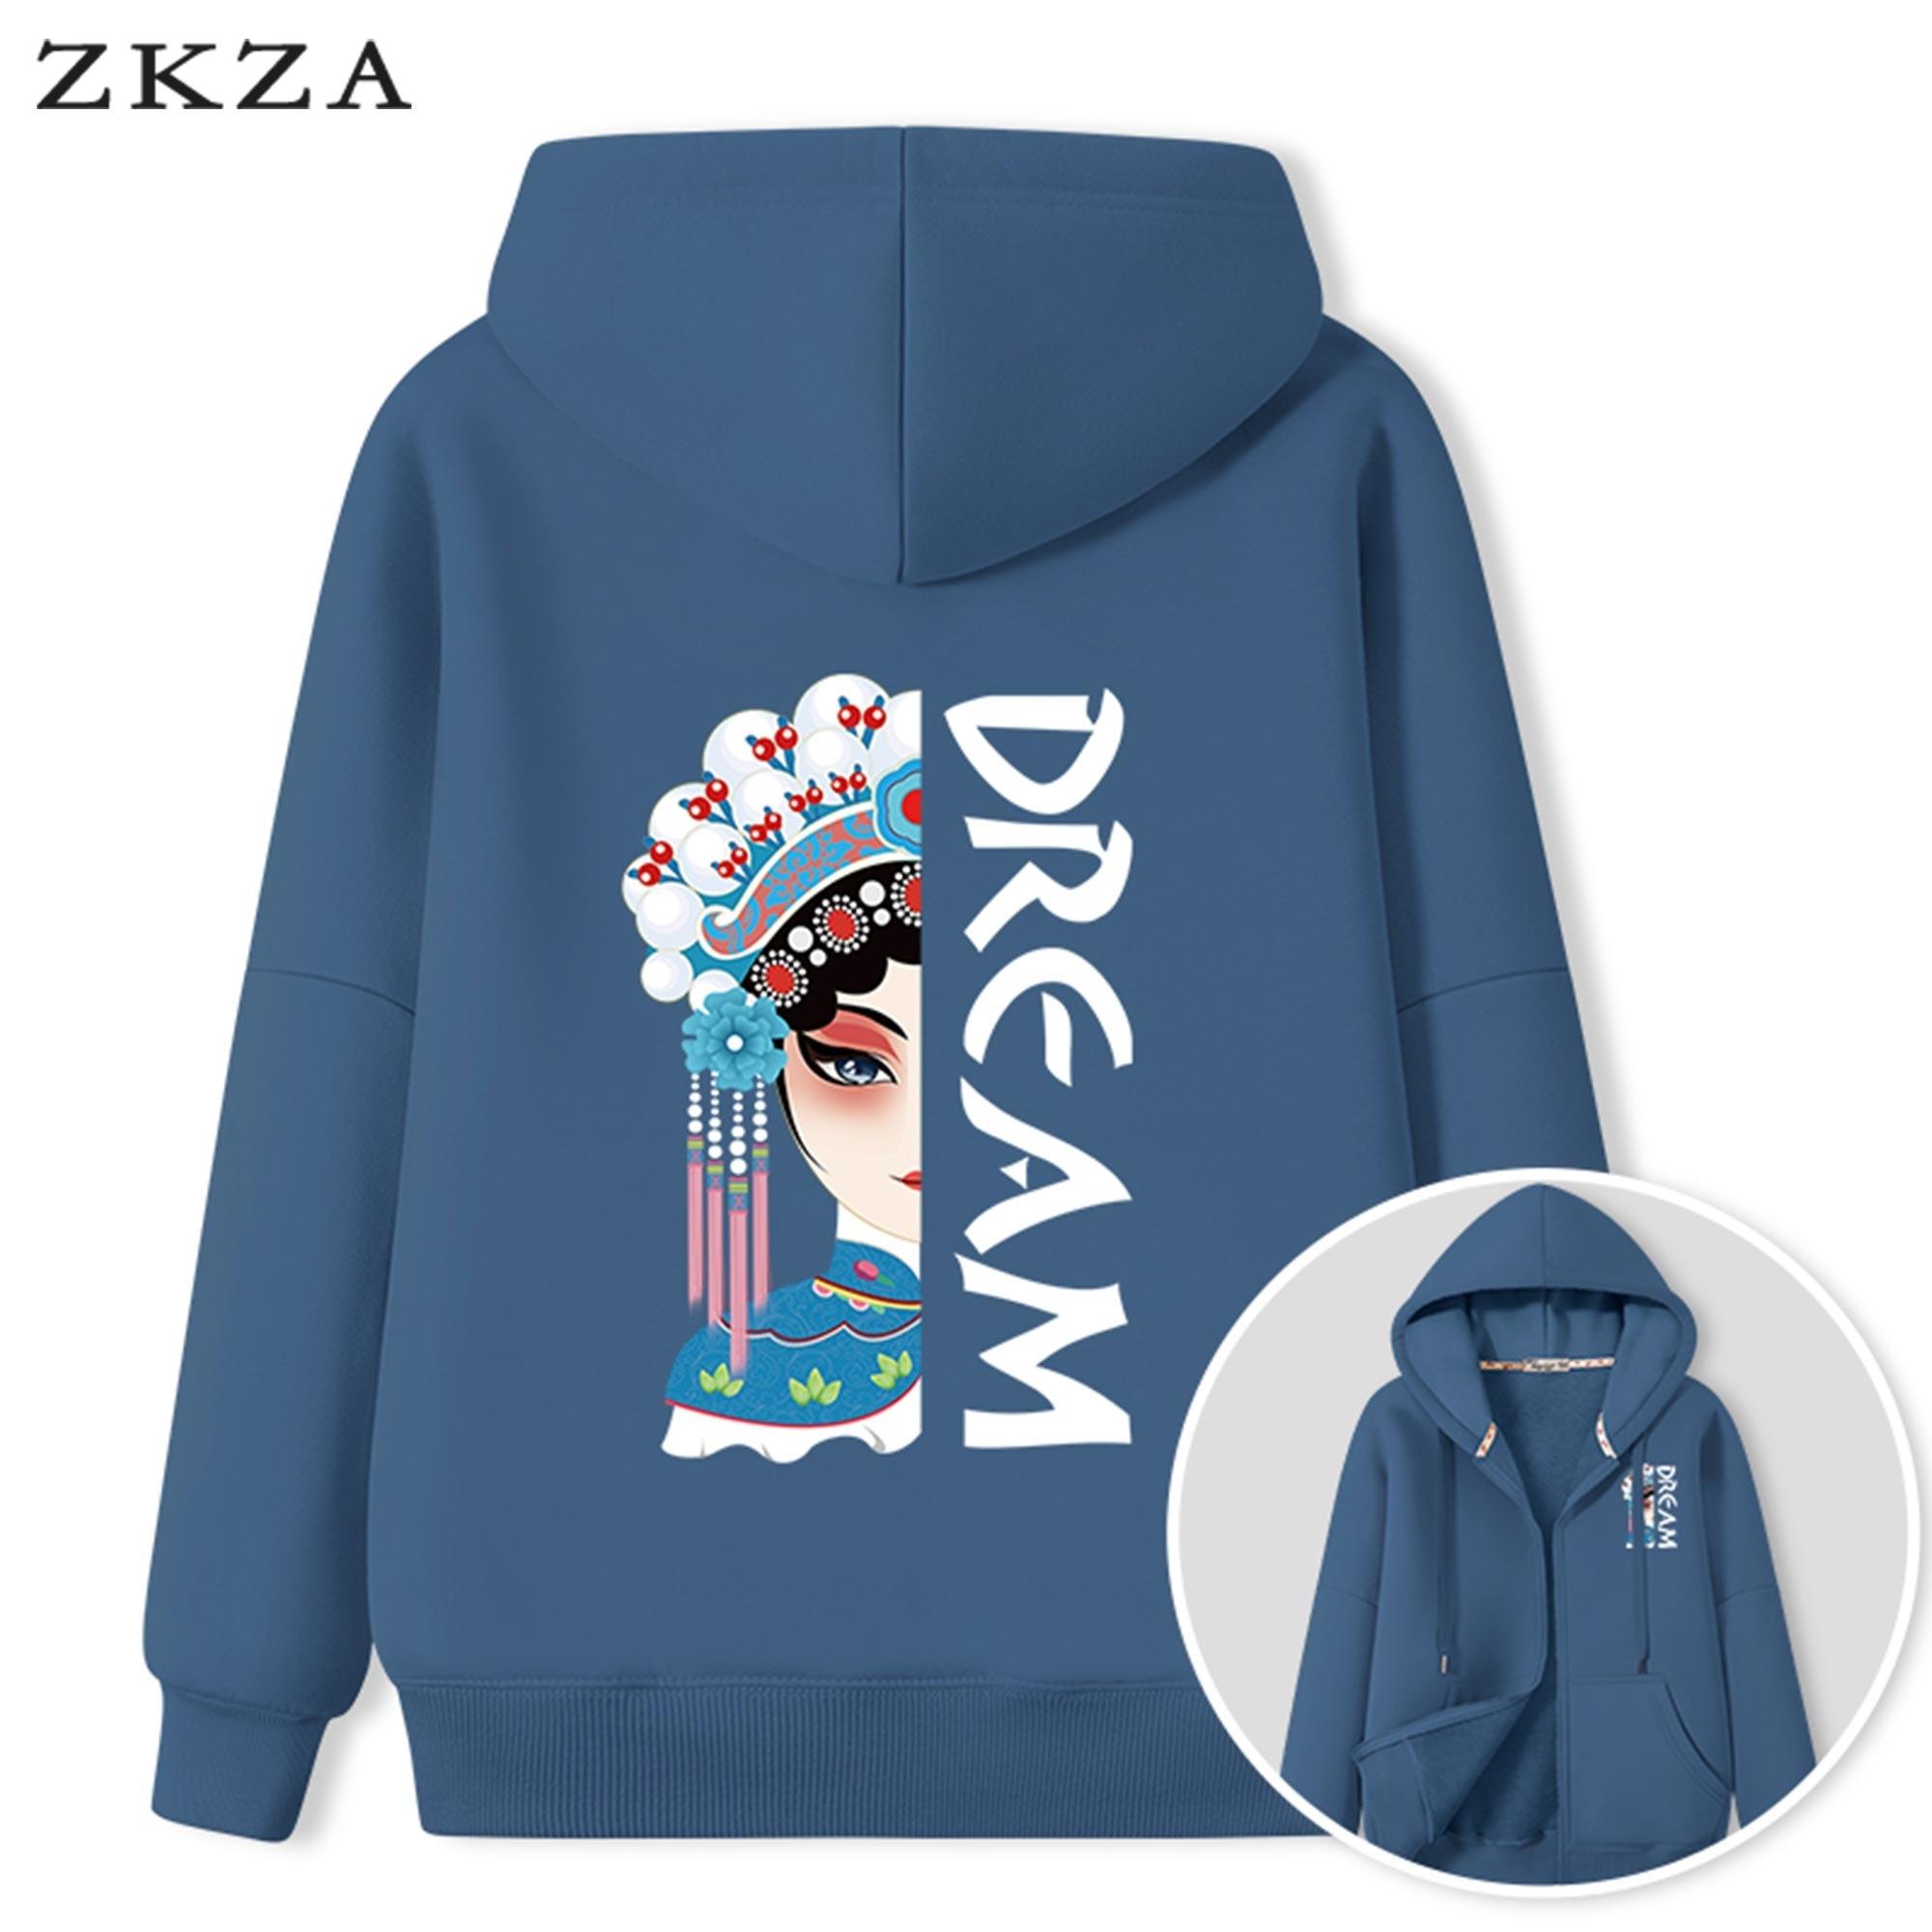 Women Hoodies Zip Up Long Sleeve 2021 Spring Autumn Thin Casual Fashion Sweatshirts Printing Peking